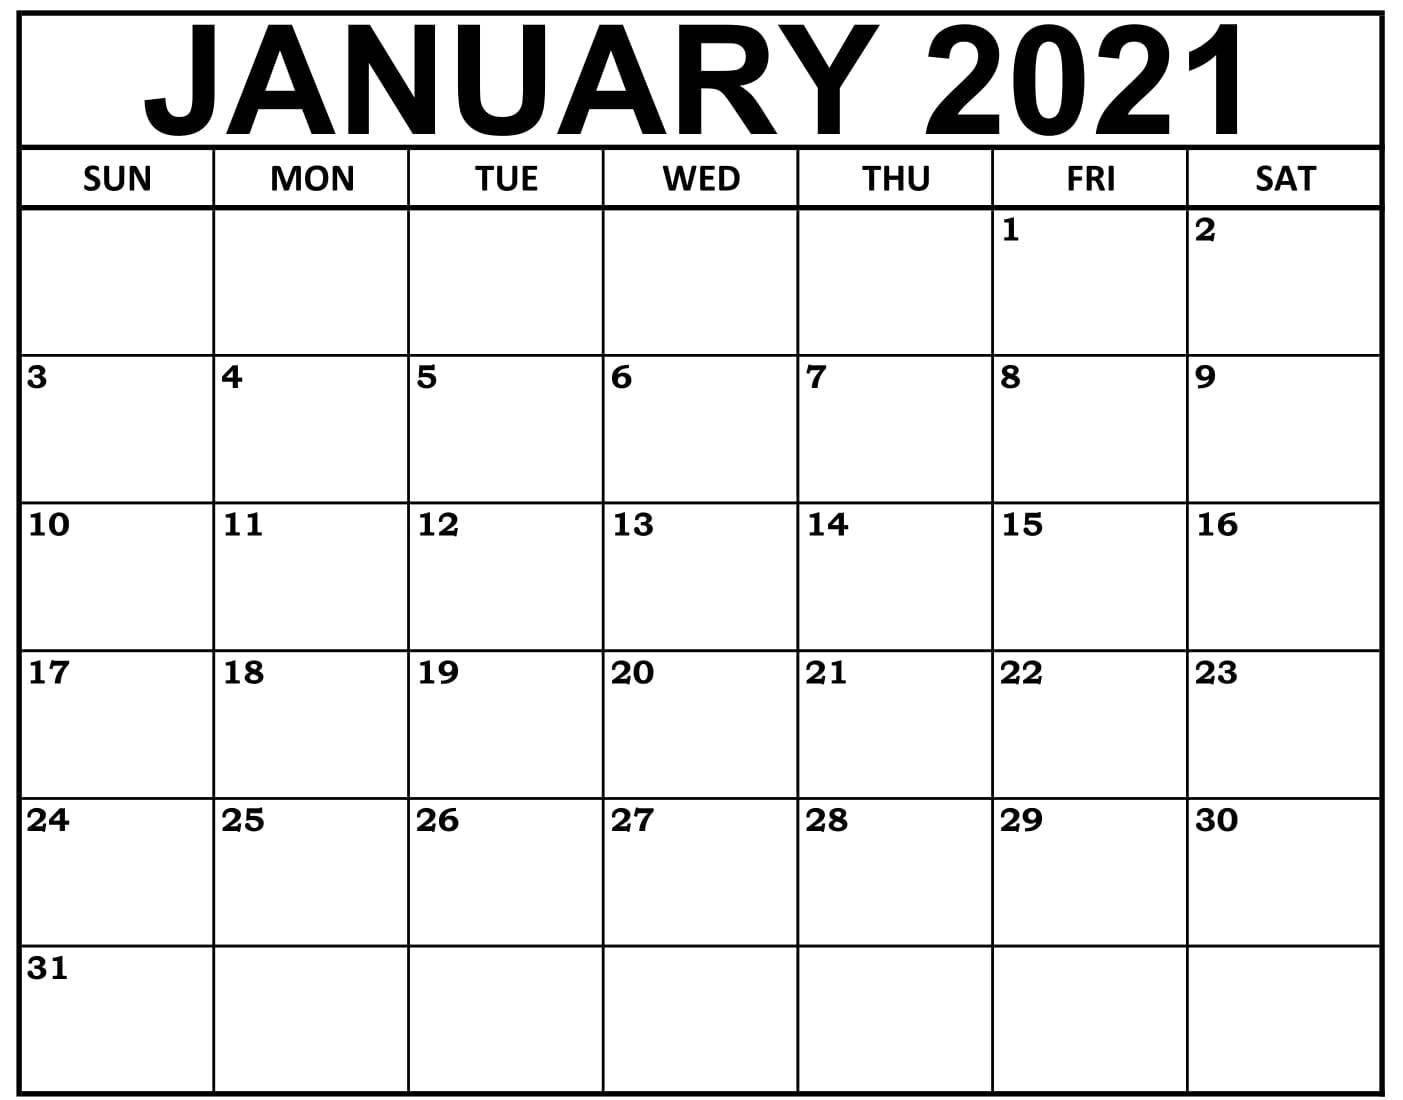 Calendar 2021 With Holidays Canada